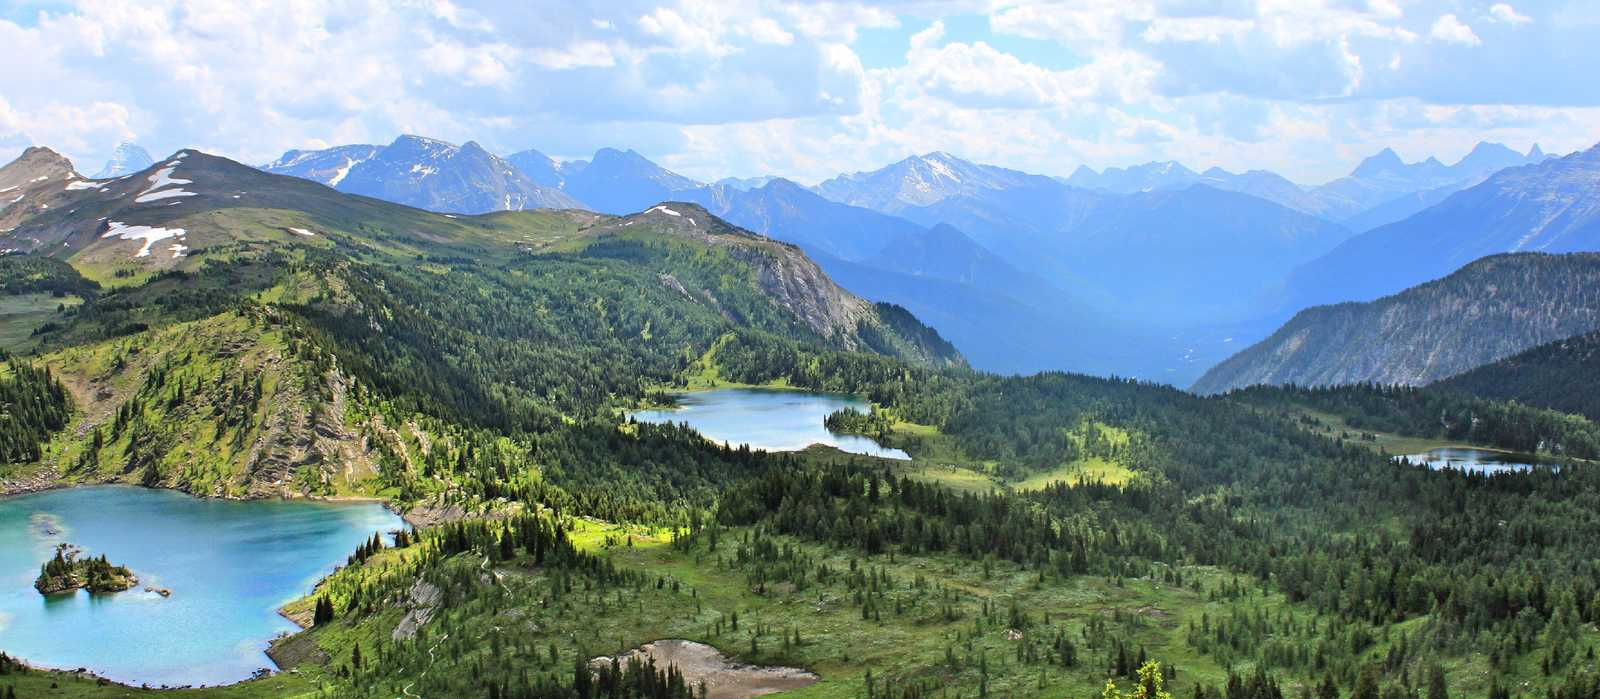 Sunshine Meadows im Banff National Park, Alberta